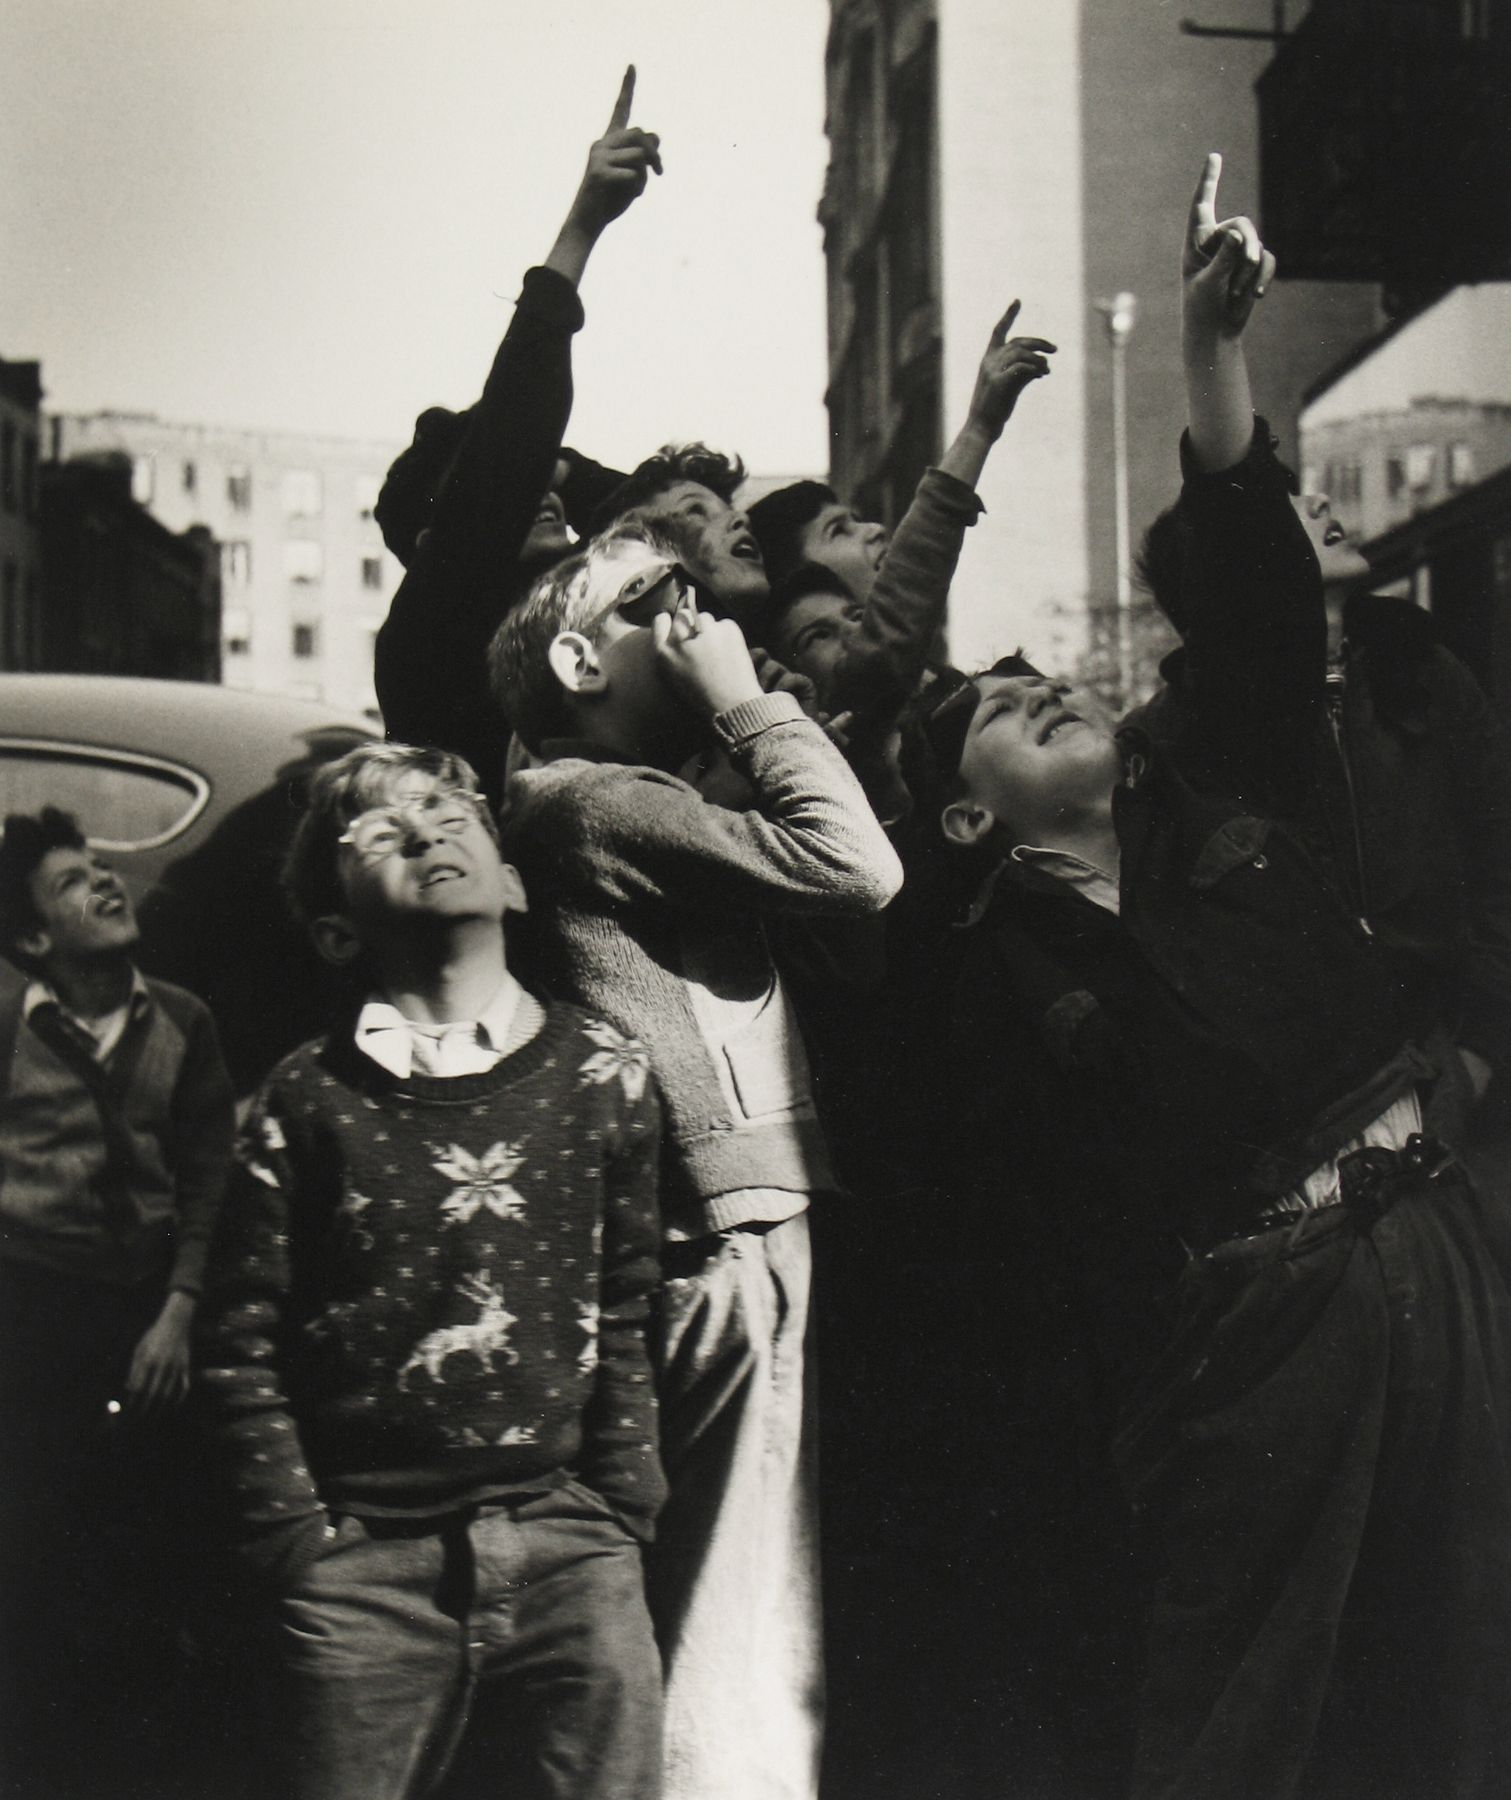 Rebecca Lepkoff - Lower East Side, 1940s - Howard Greenberg Gallery